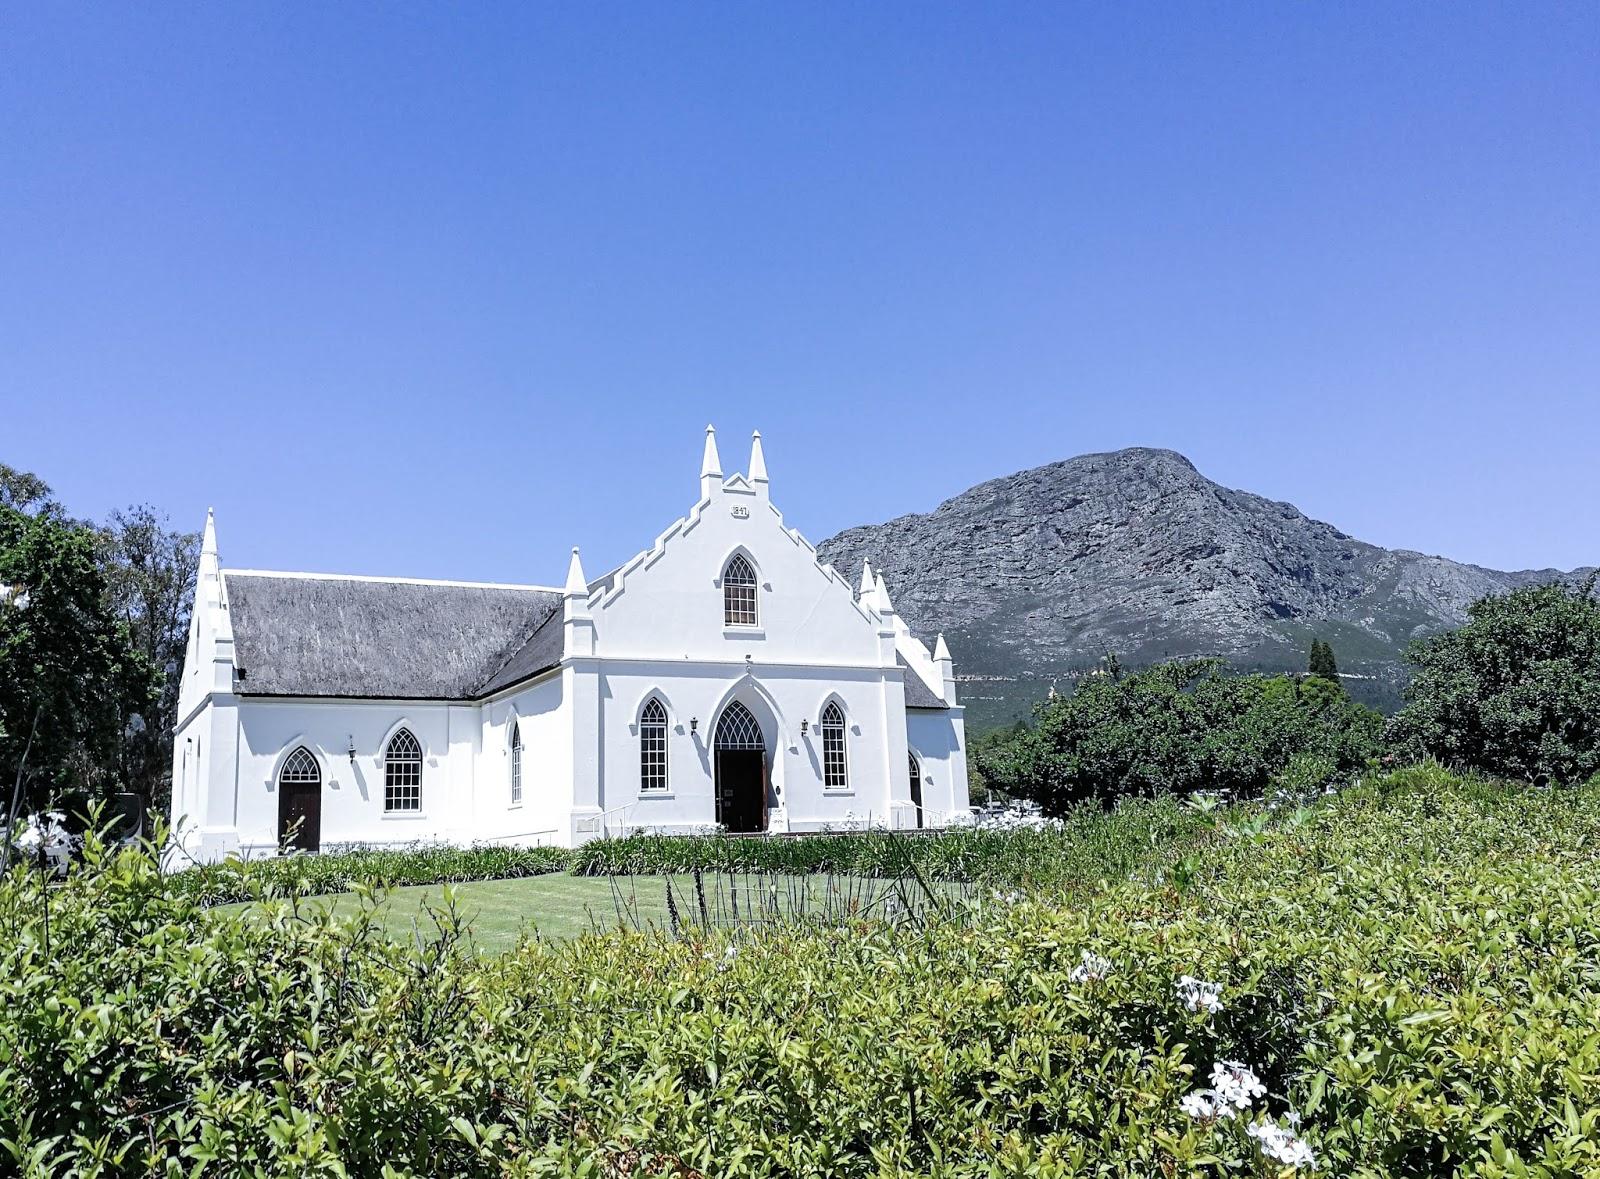 cape town kapkaupunki franschhoek etelä-afrikka south africa